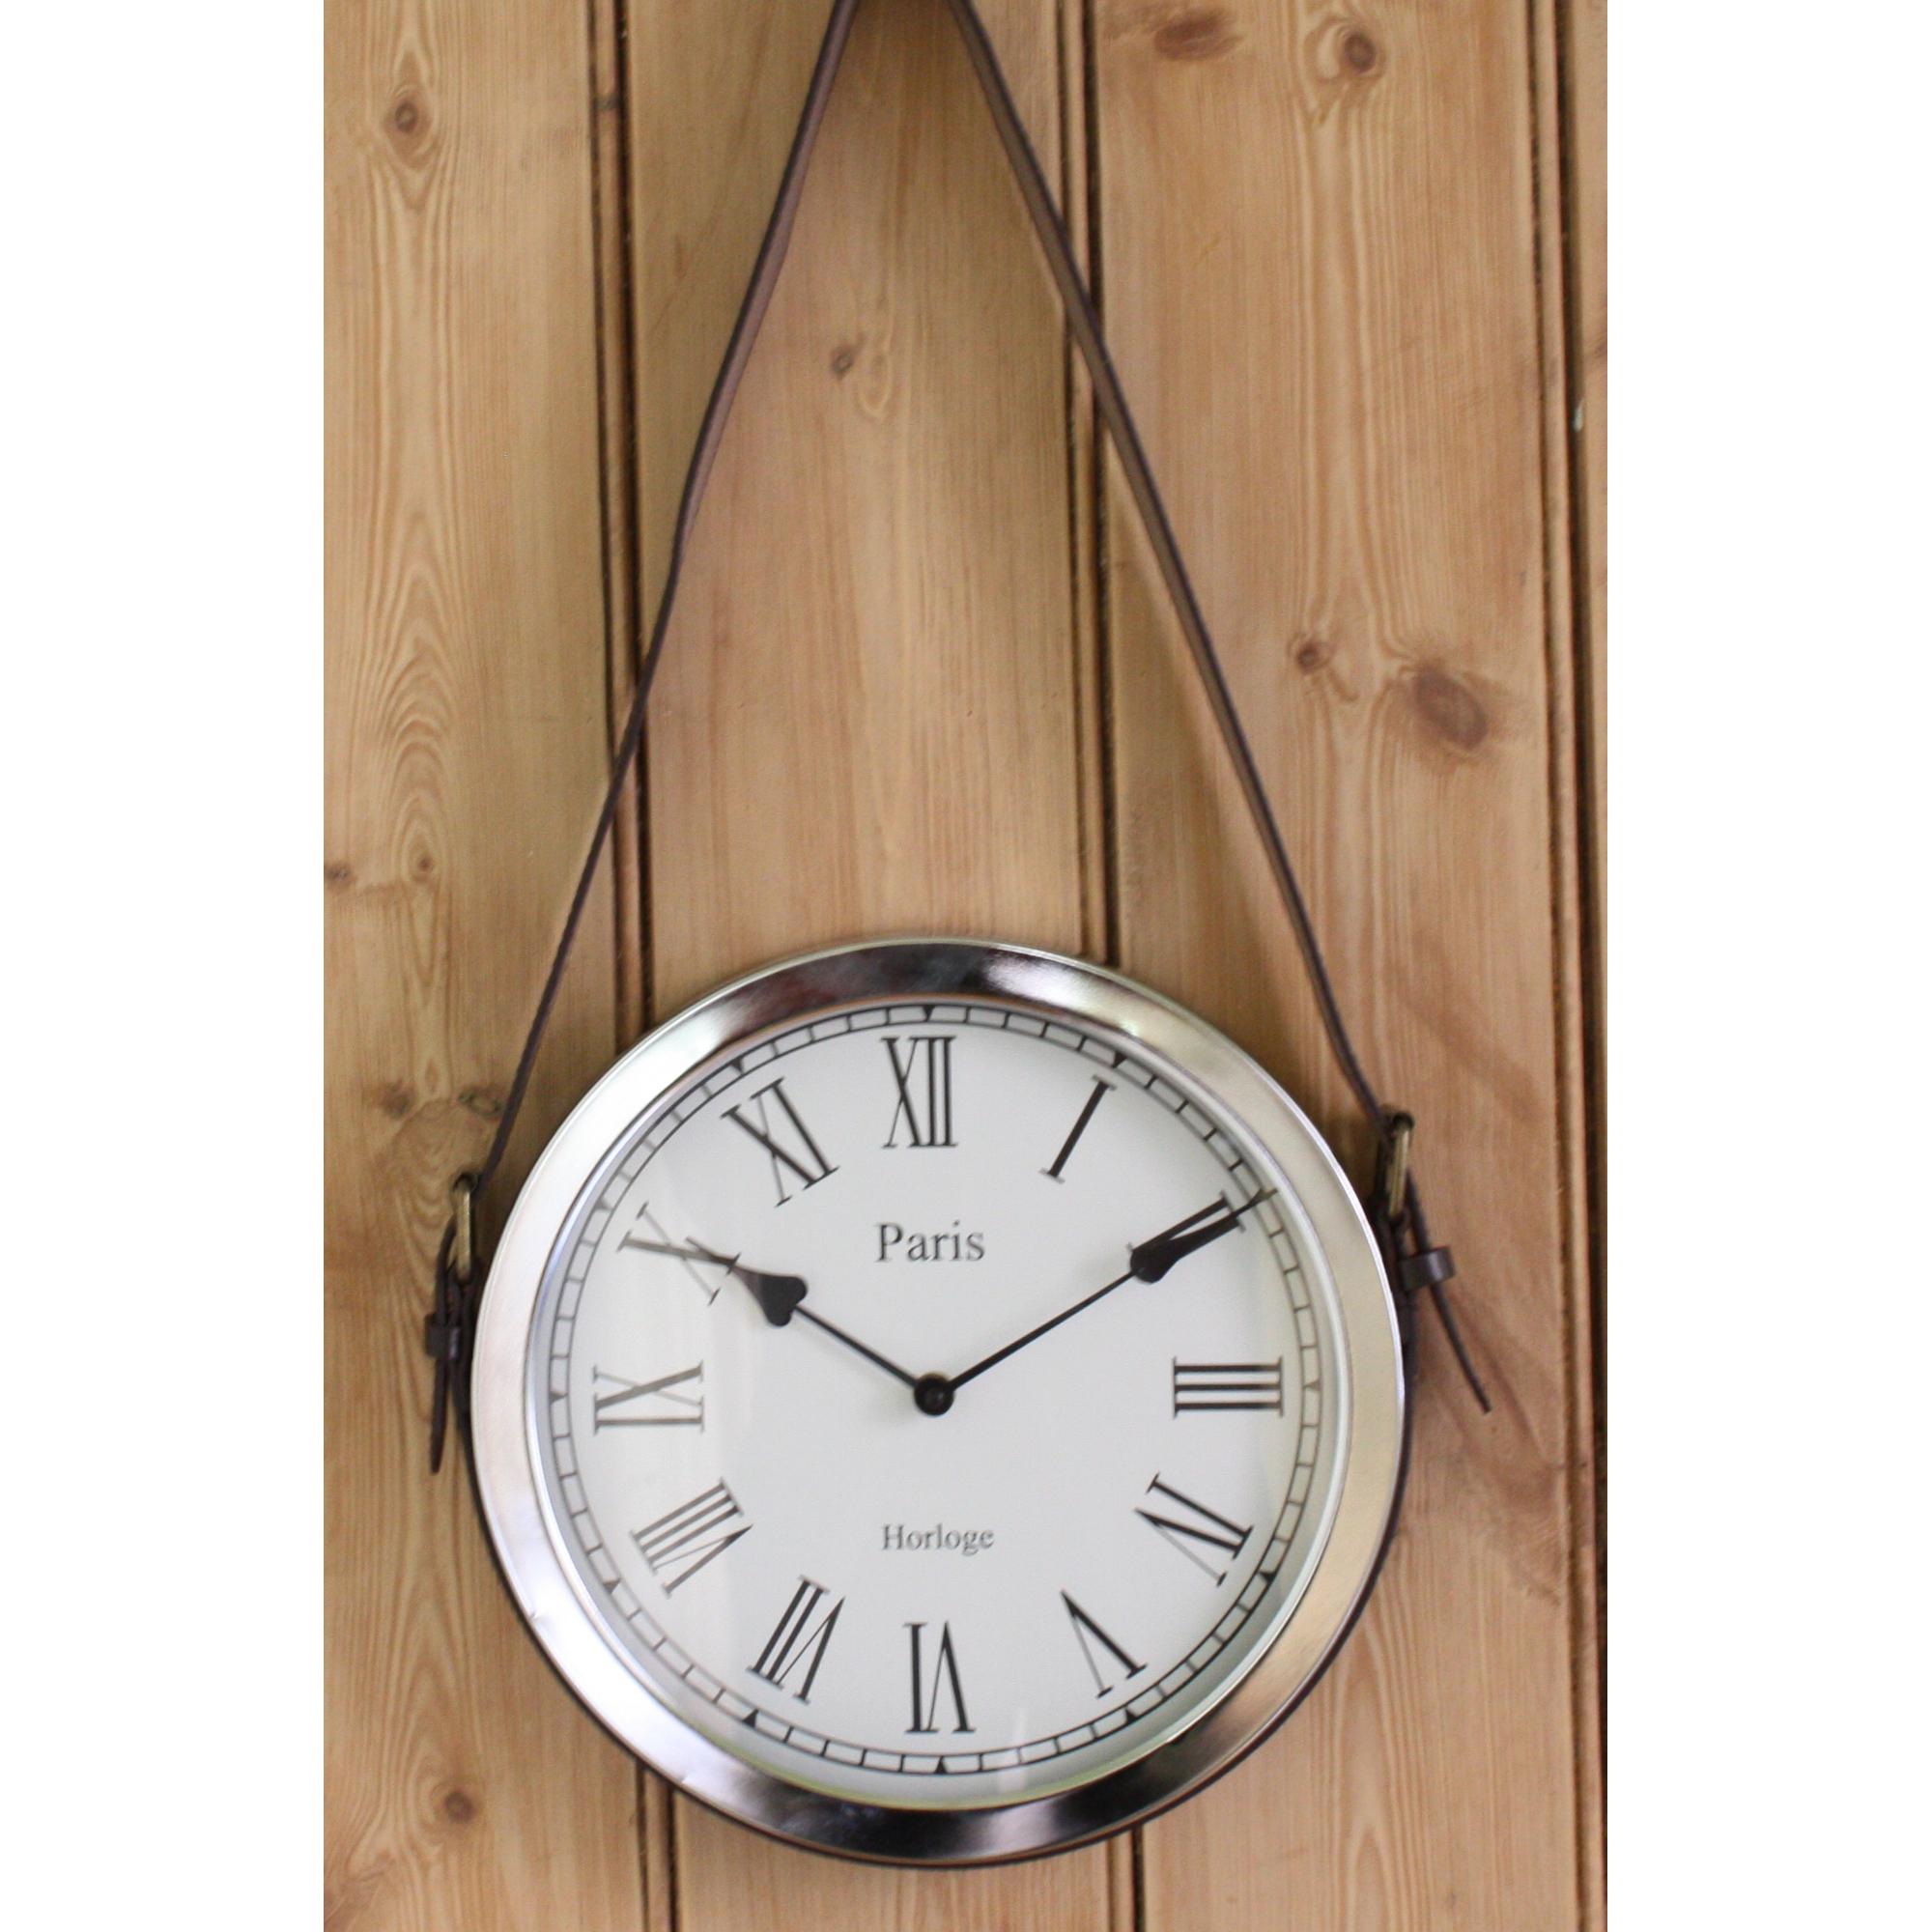 Hanging a Wall Clock Using Belts